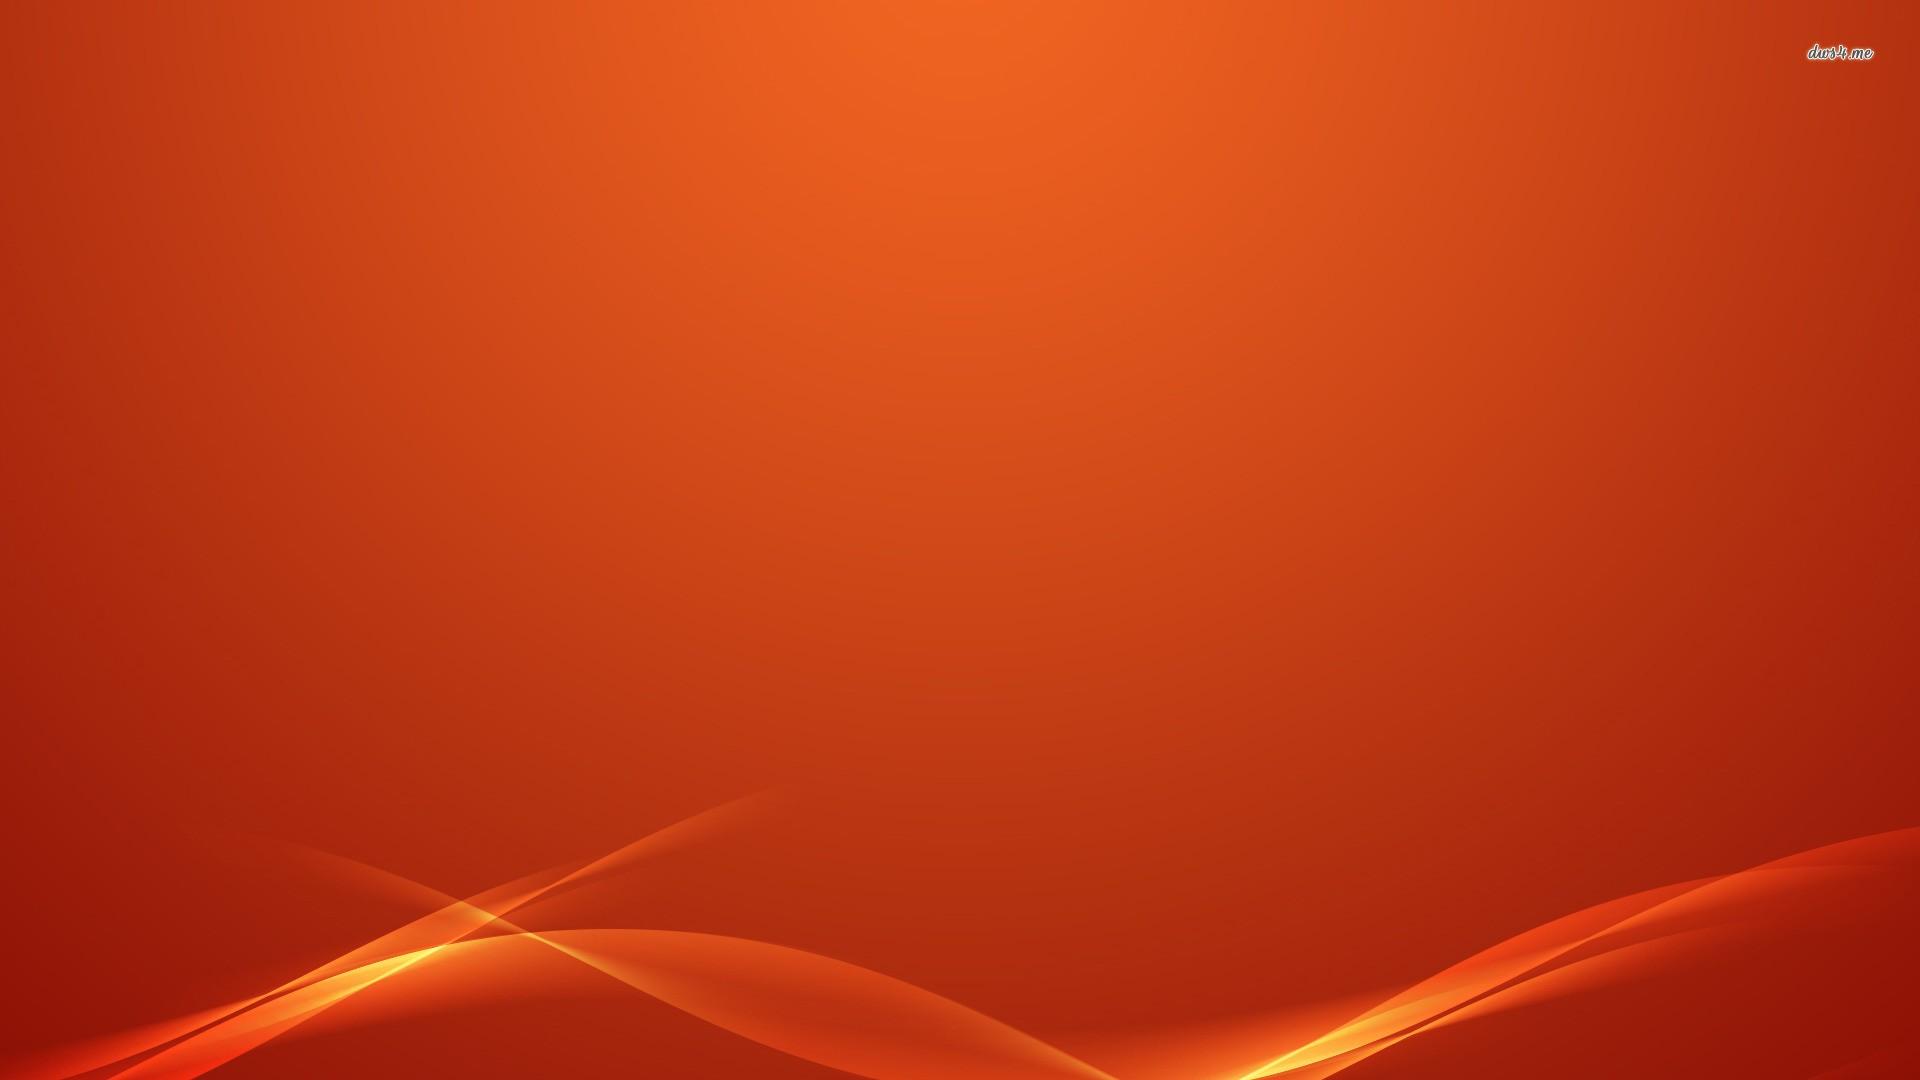 General 1920x1080 abstract shapes minimalism orange background